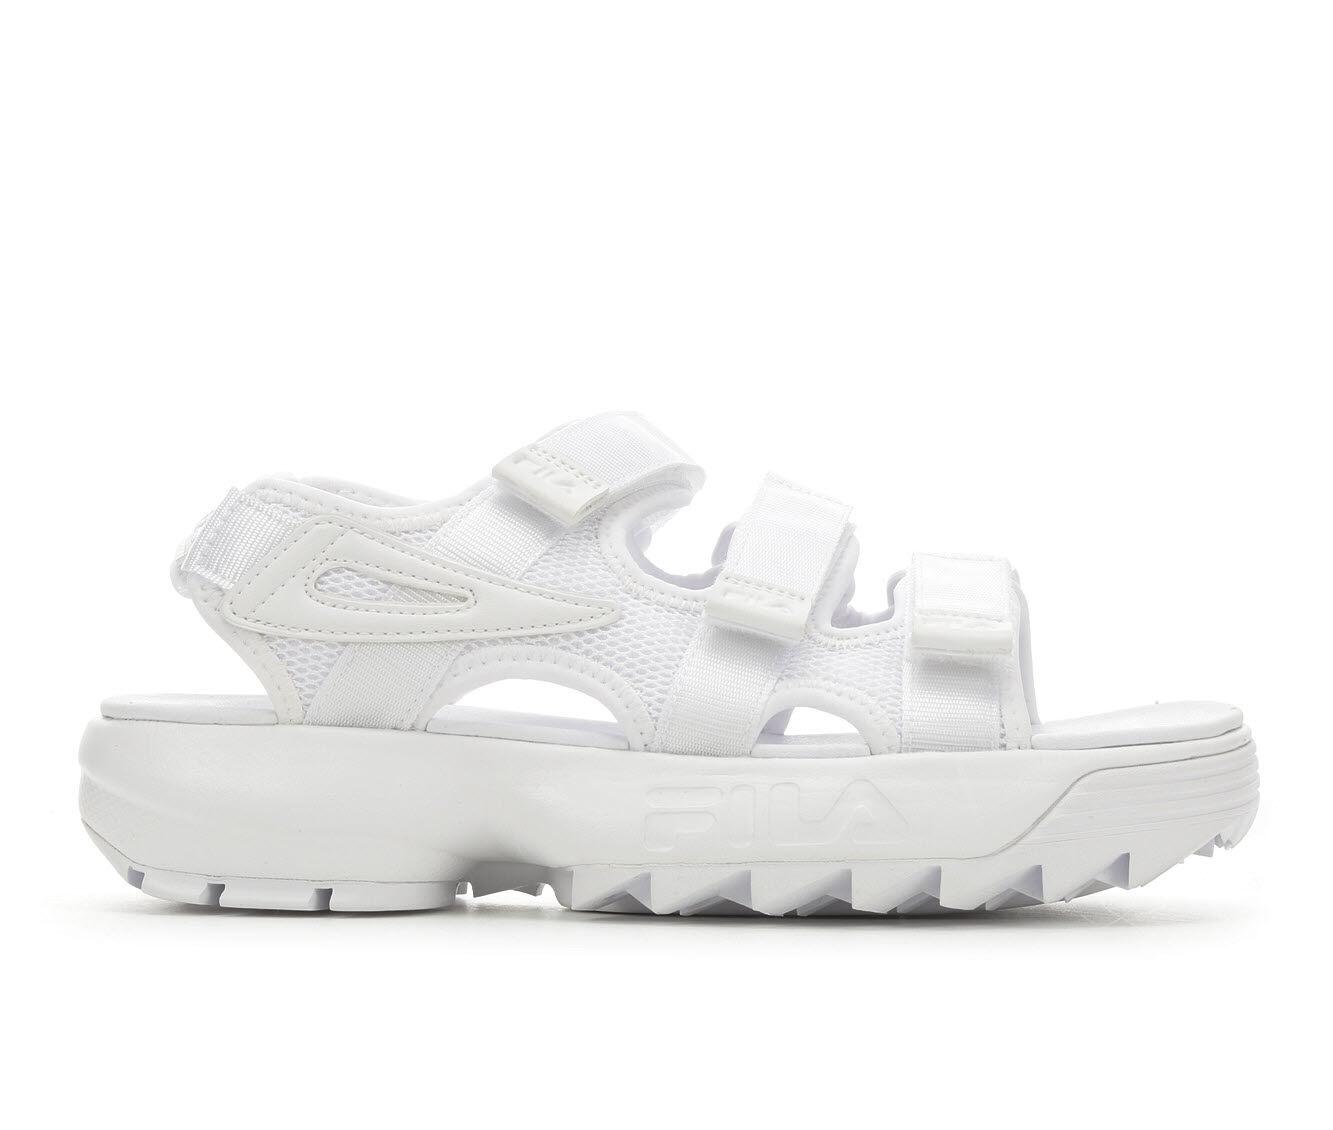 Women's Fila Disruptor Sandal Flatform Sandals White/White/Wh